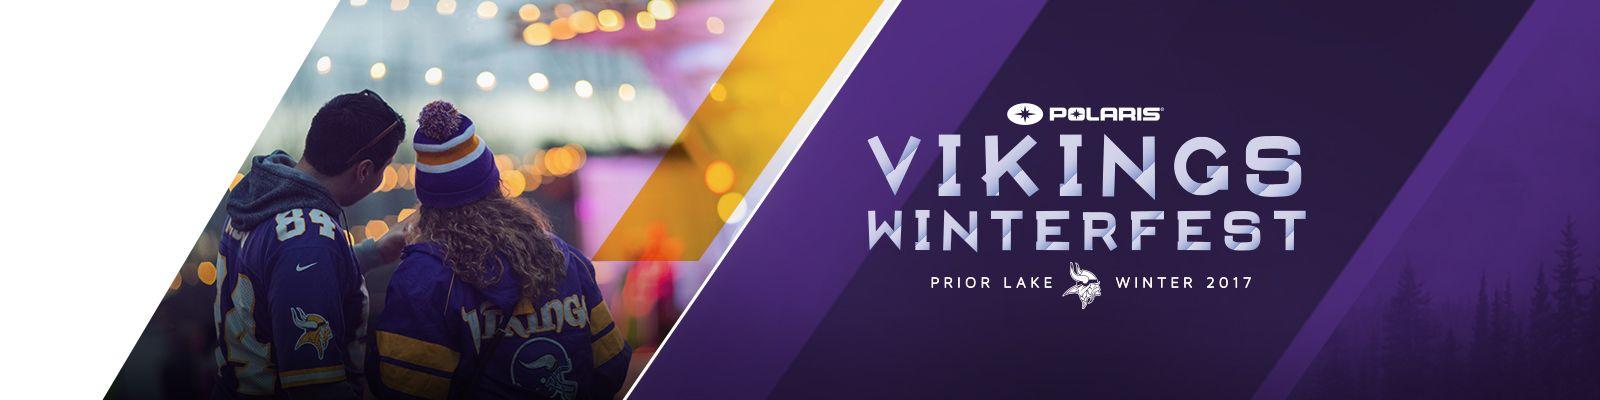 Winterfest_1600x400